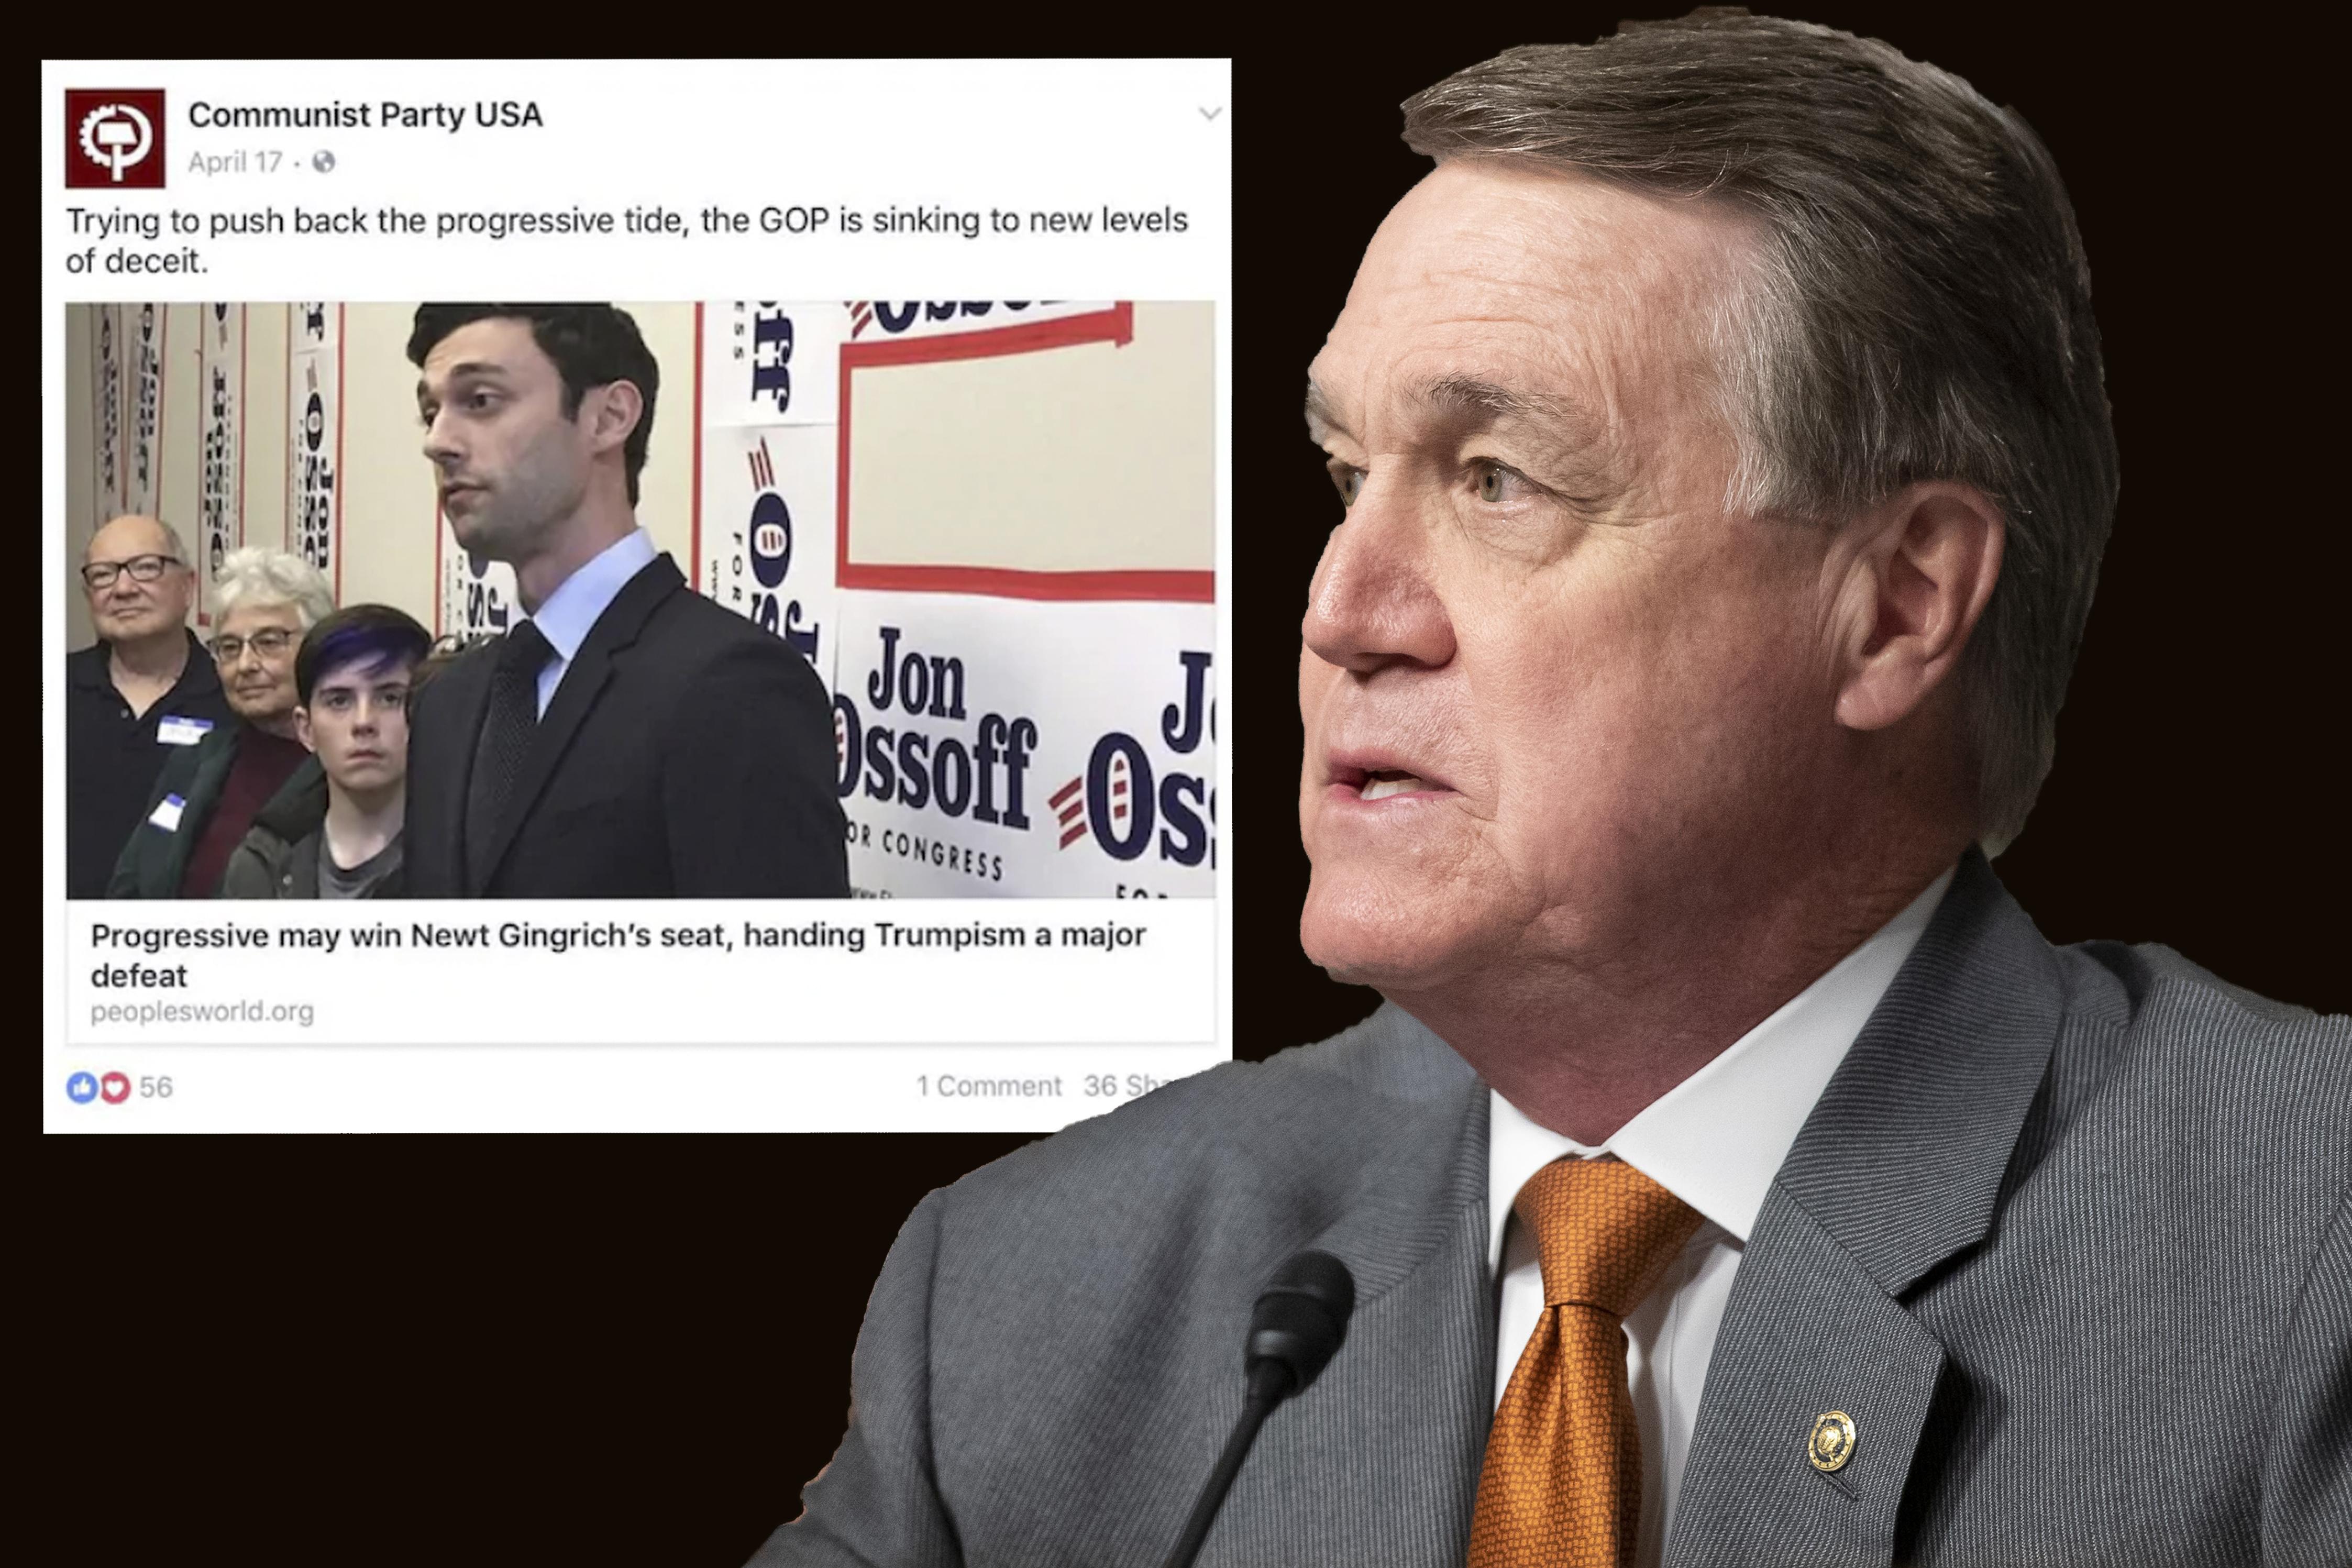 Republican senator uses People's World in anti-communist smear attack